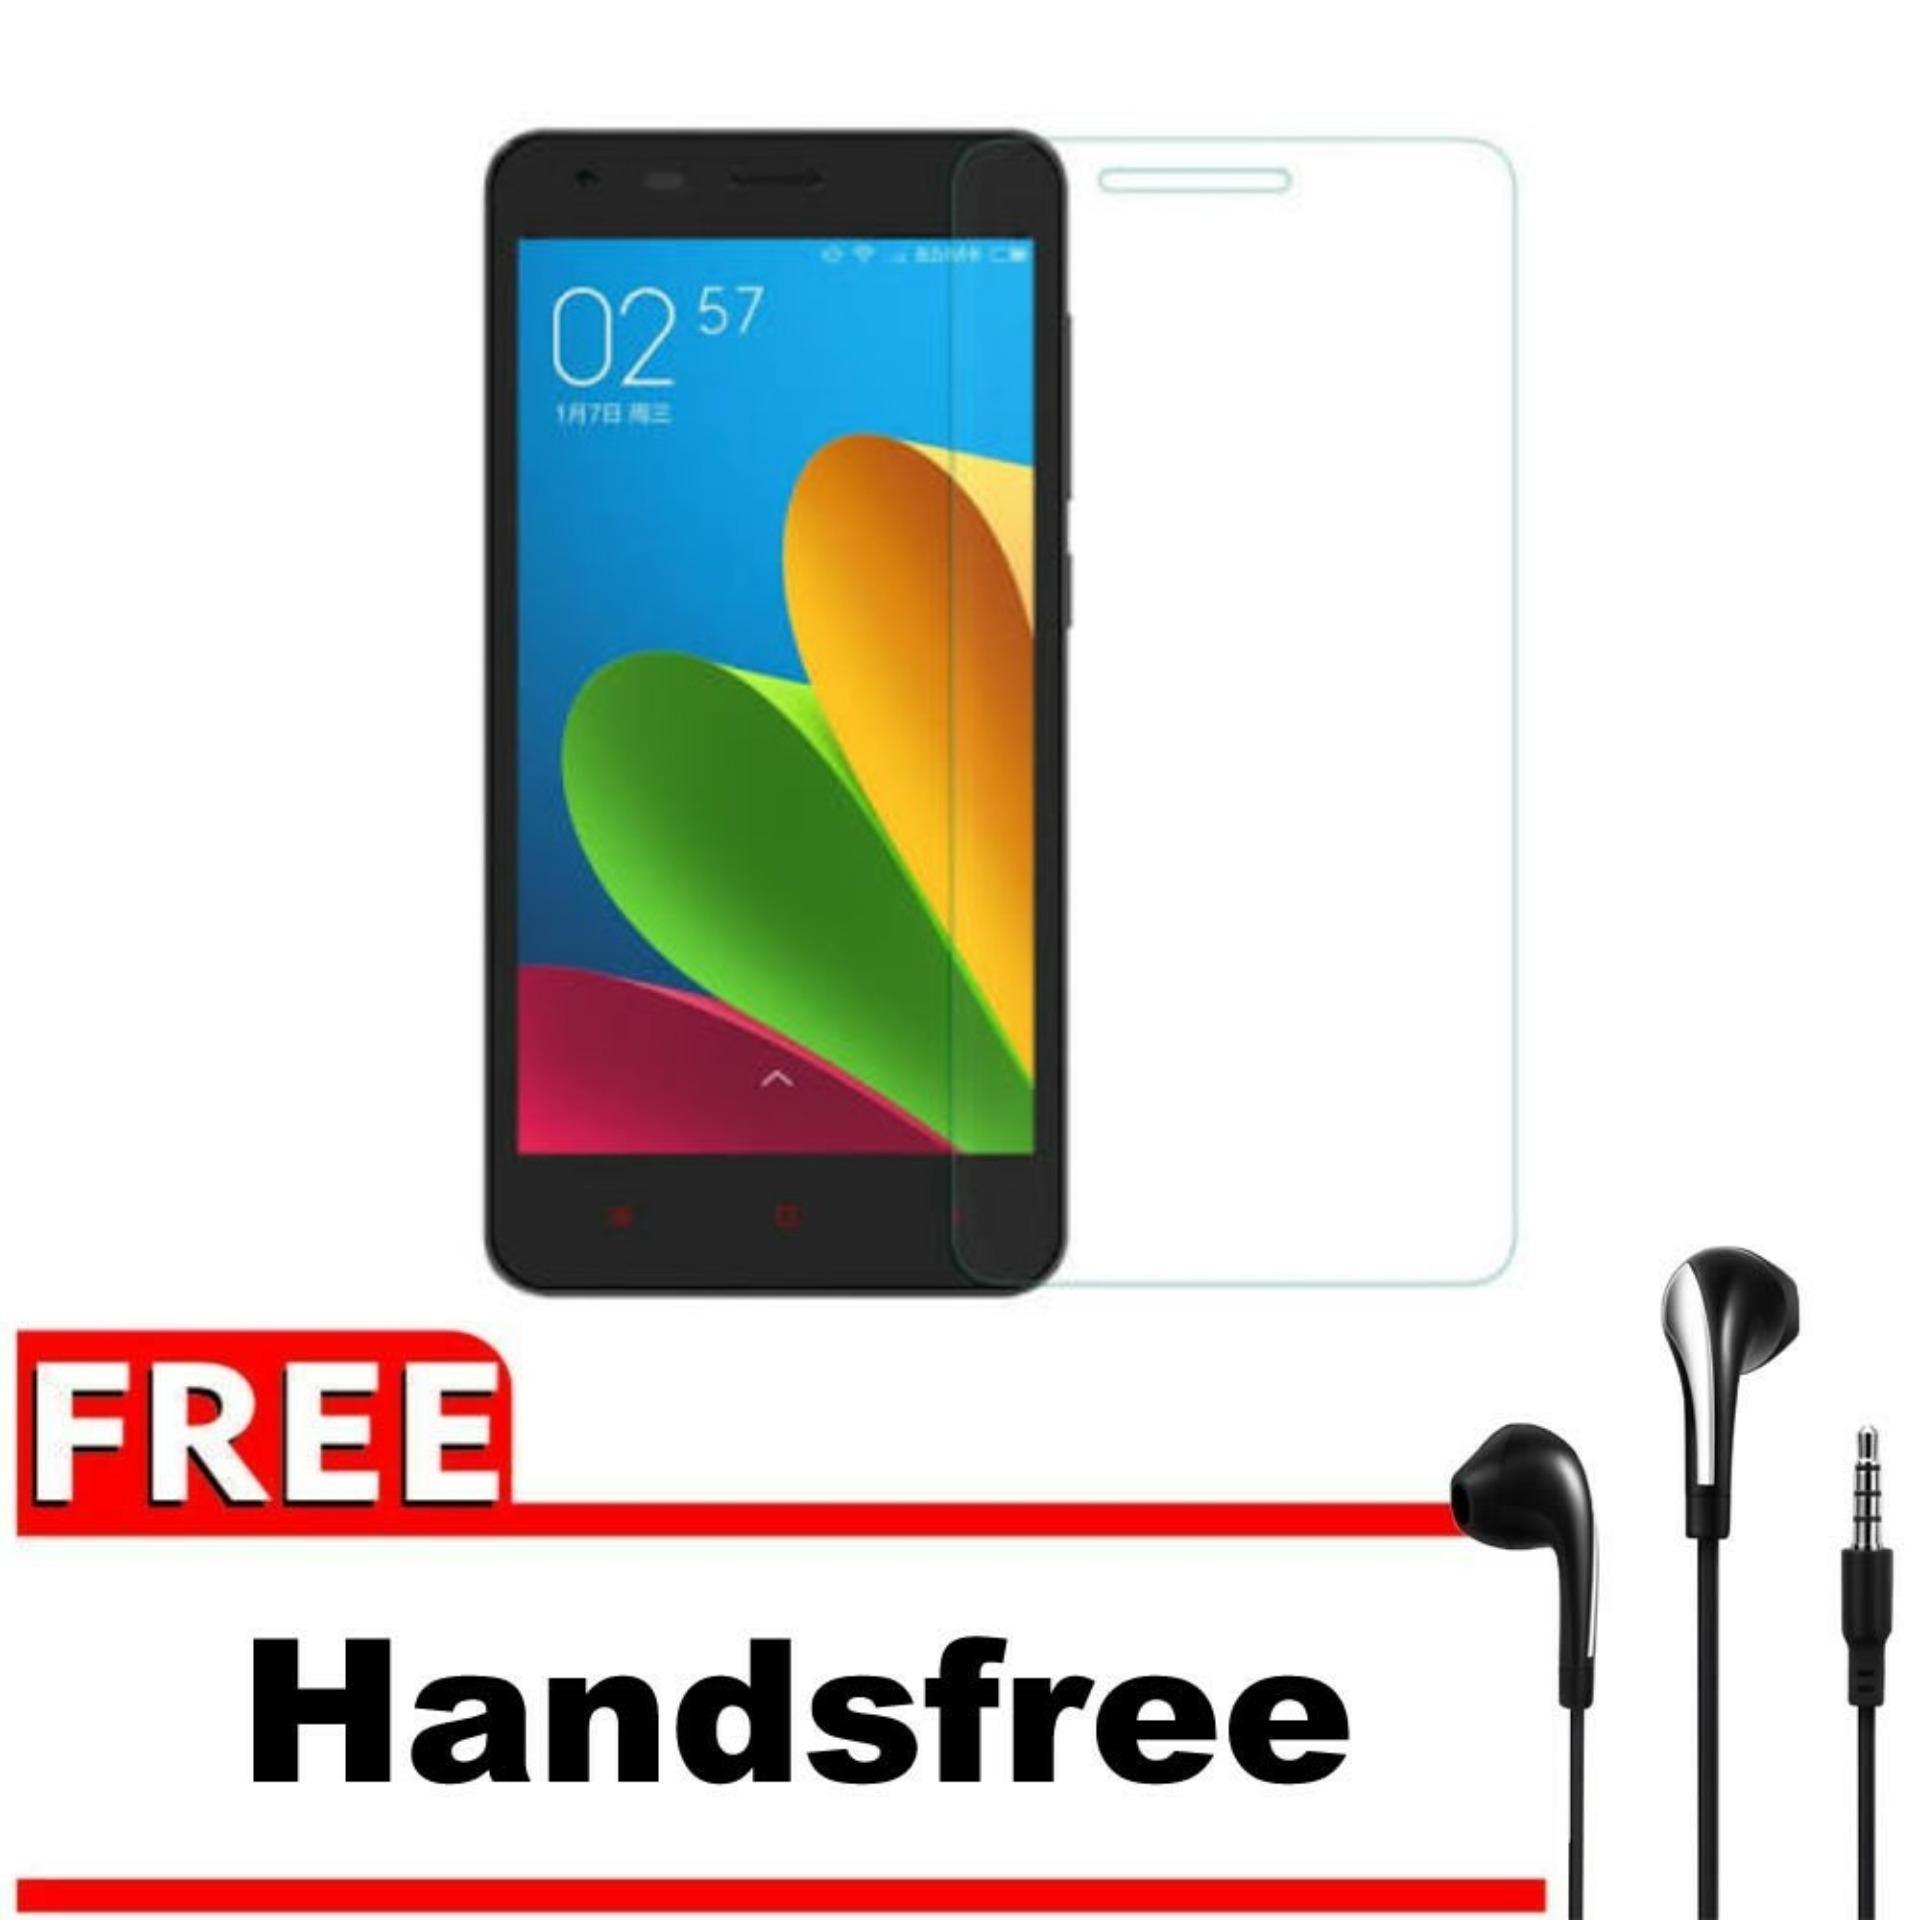 ... Tempered Glass 9H Screen Protector 0.32mm + Gratis Free Handsfree Earphone Headset Universal - Bening TransparanIDR14453. Rp 14.453